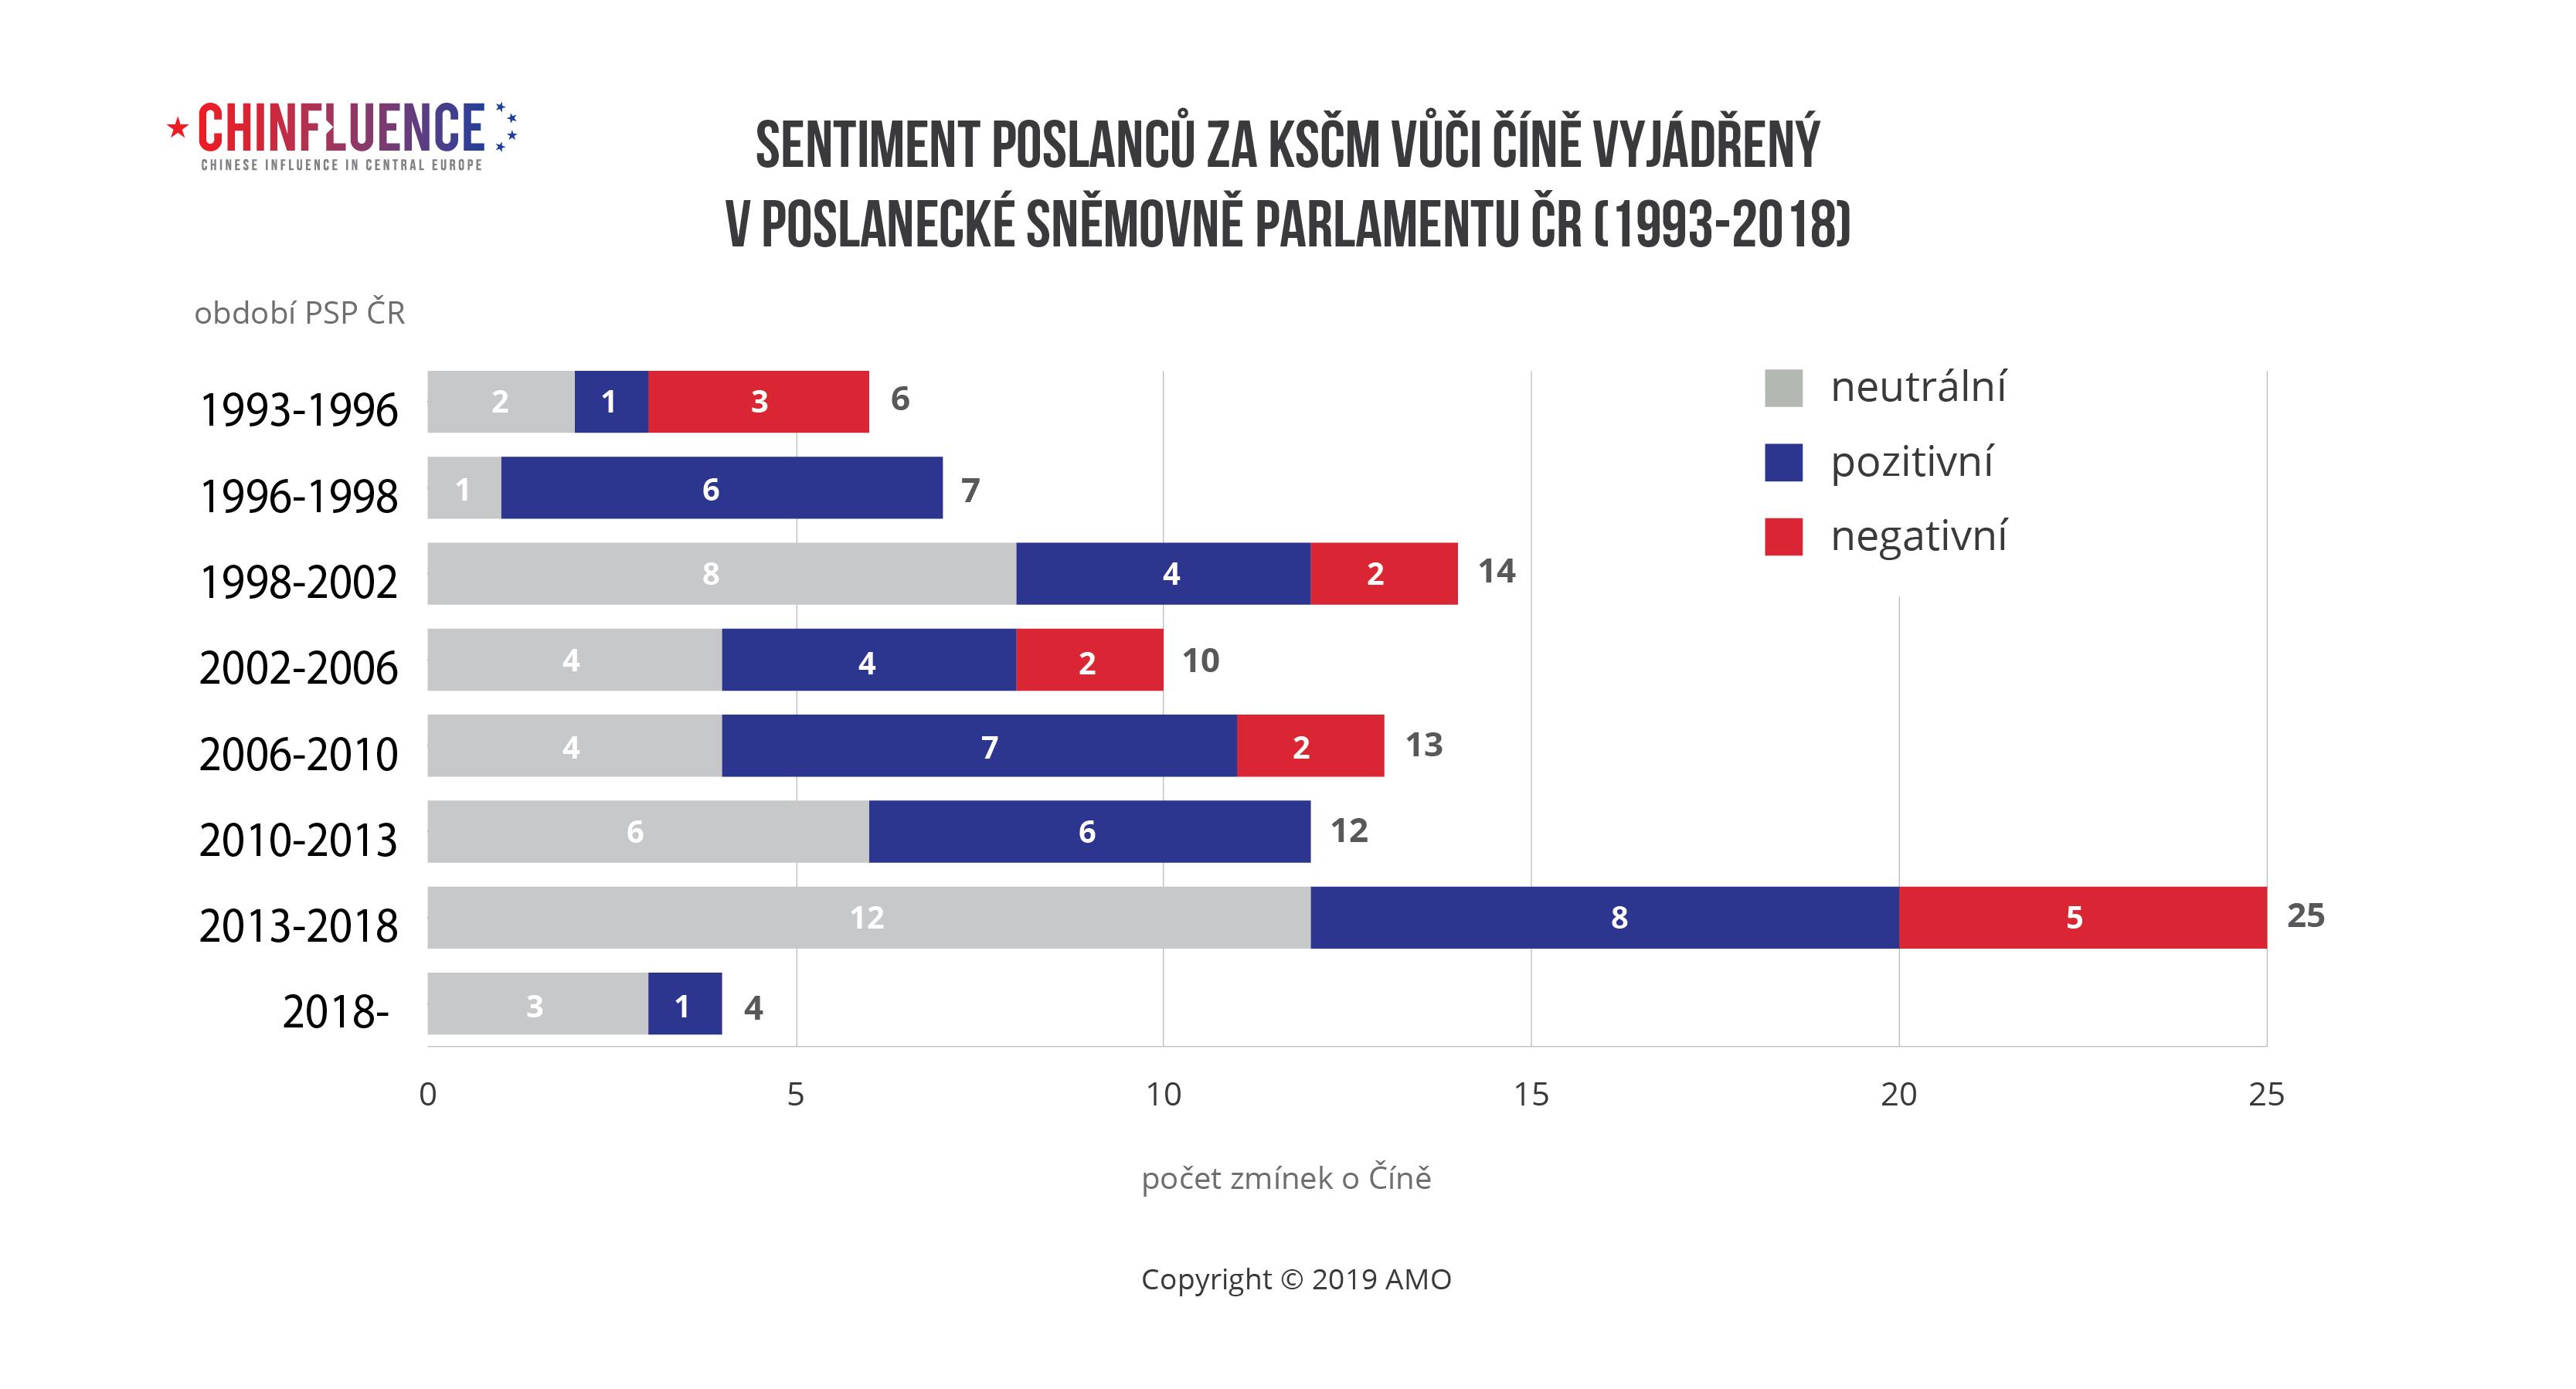 Sentiment poslancu za KSCM vuci Cine vyjadreny v Poslanecke snemovne Parlamentu CR-1993-2018-01